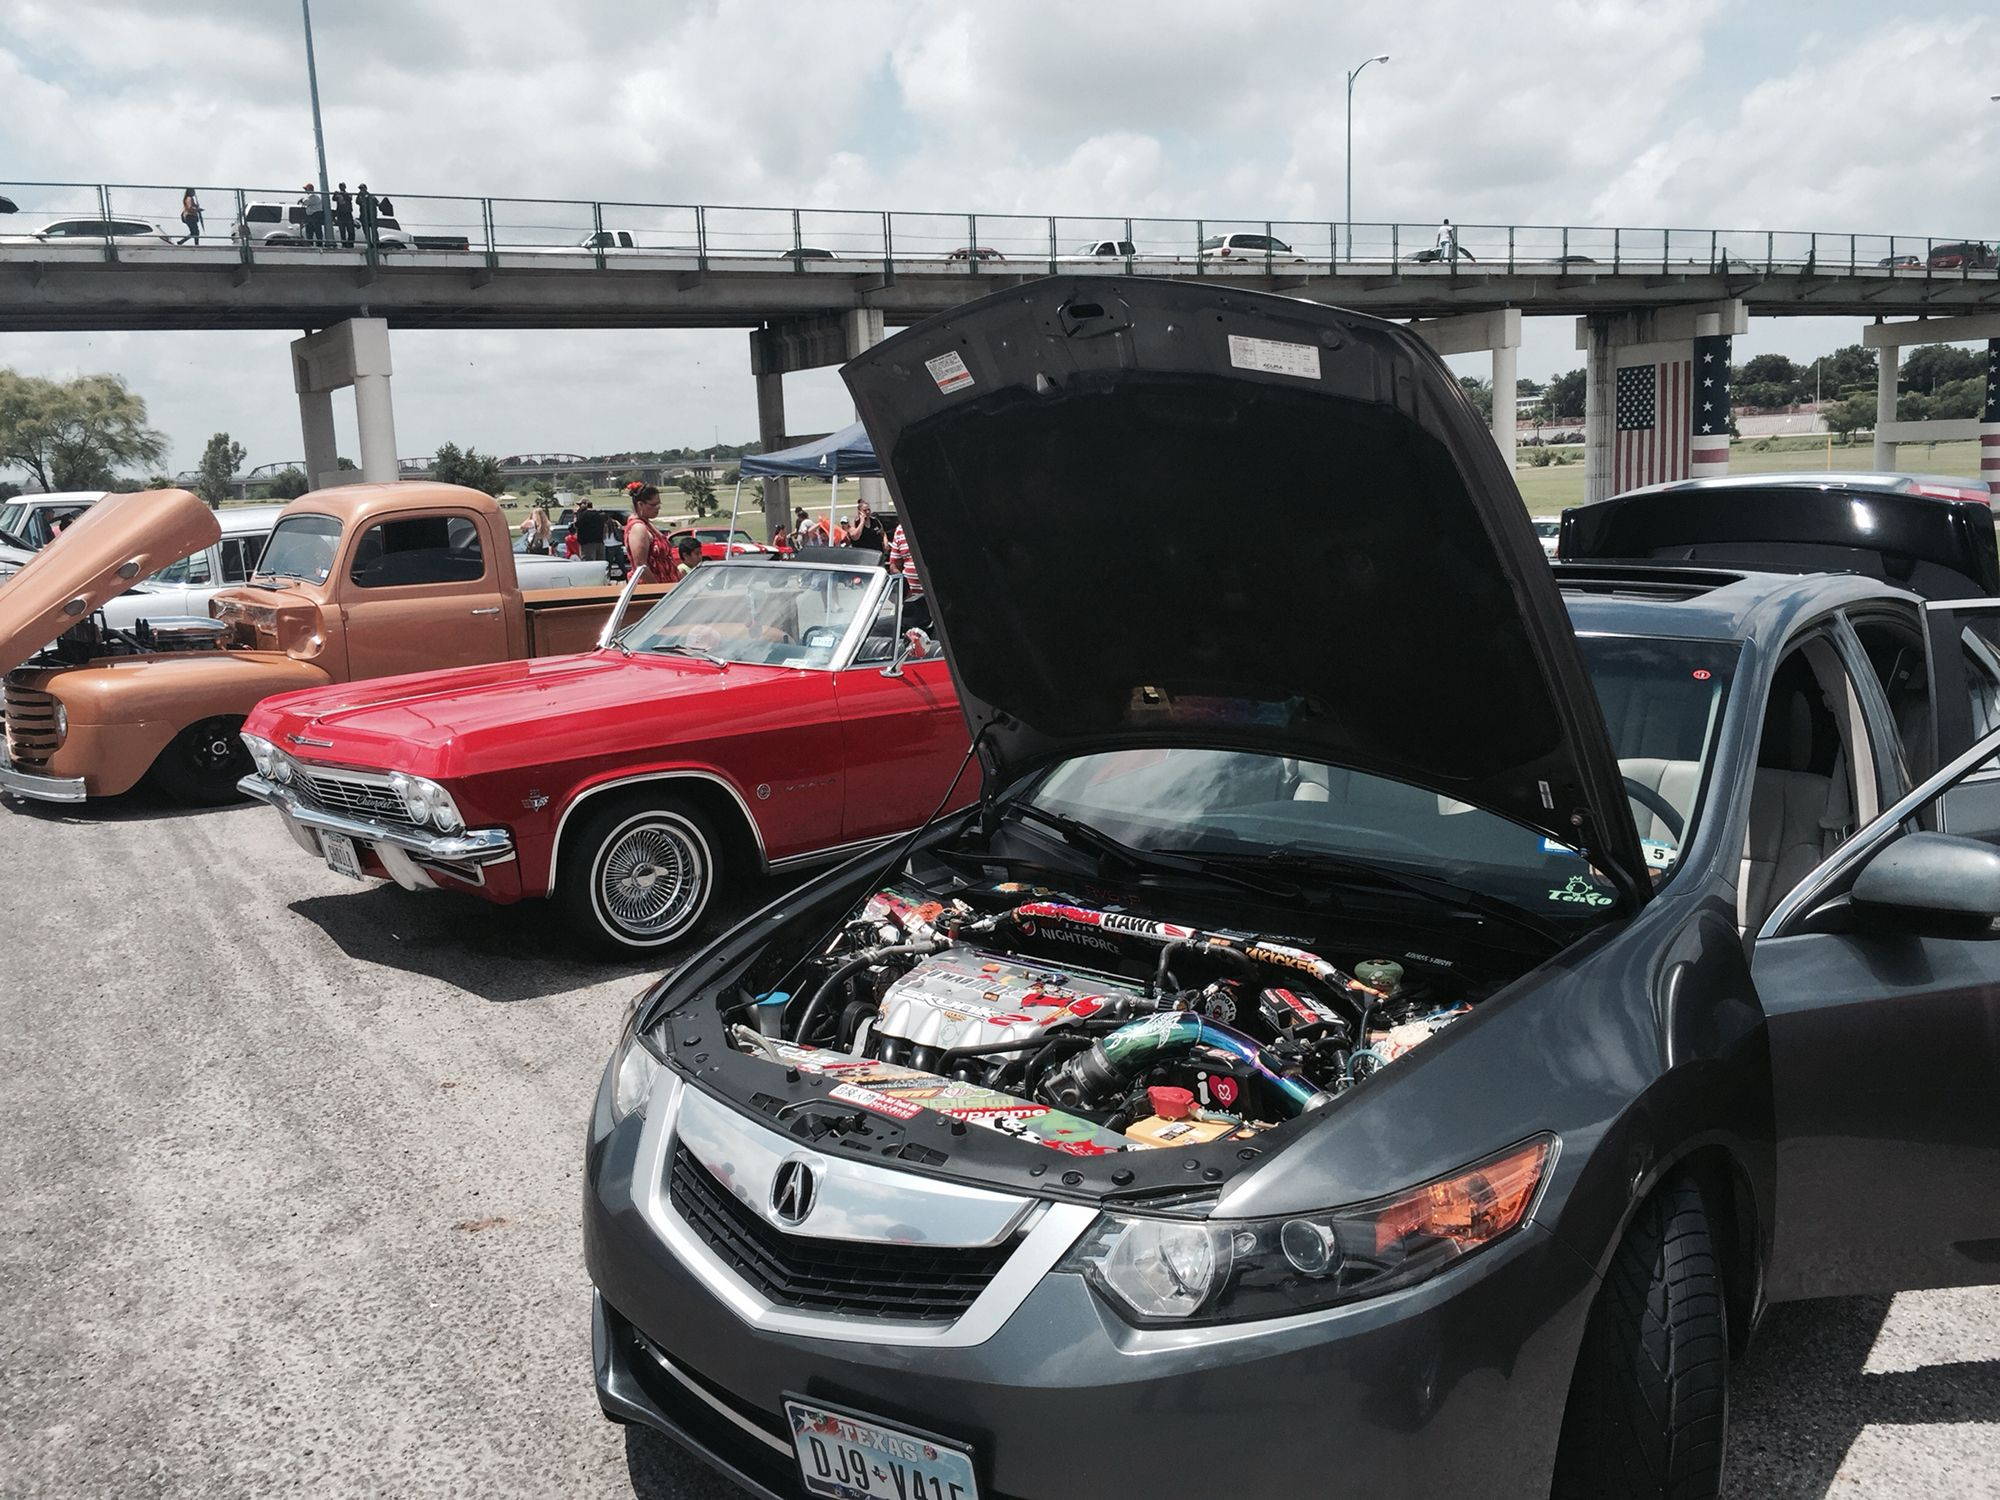 Car show pic cu2 tsx acura